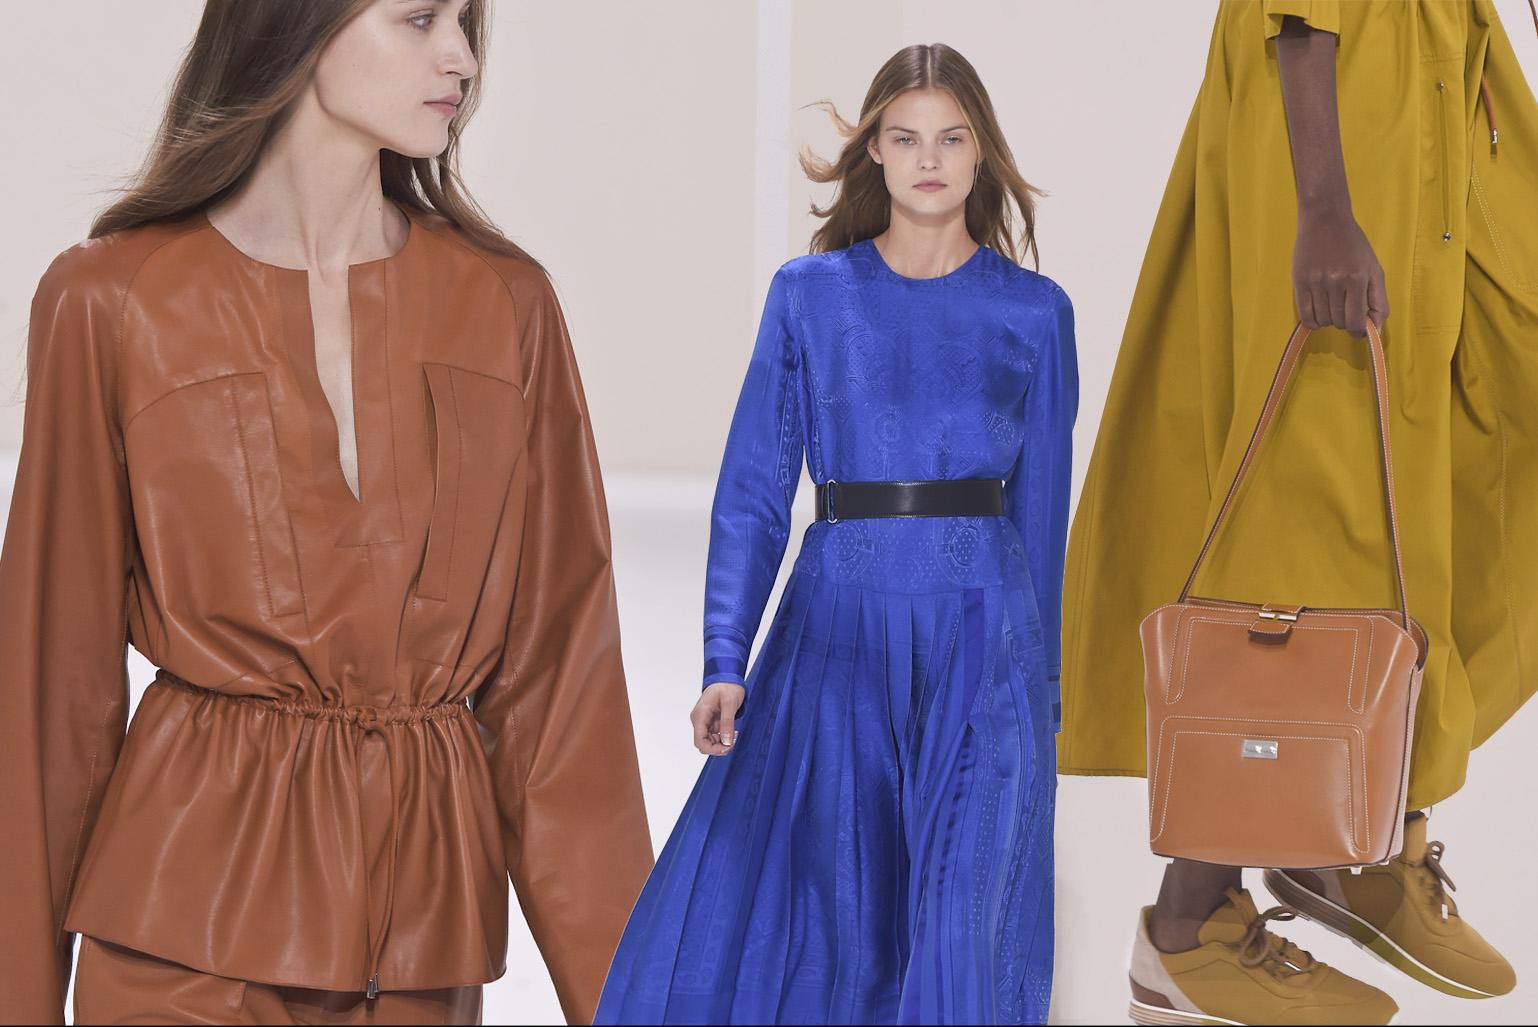 Hermès RTW Spring 2016